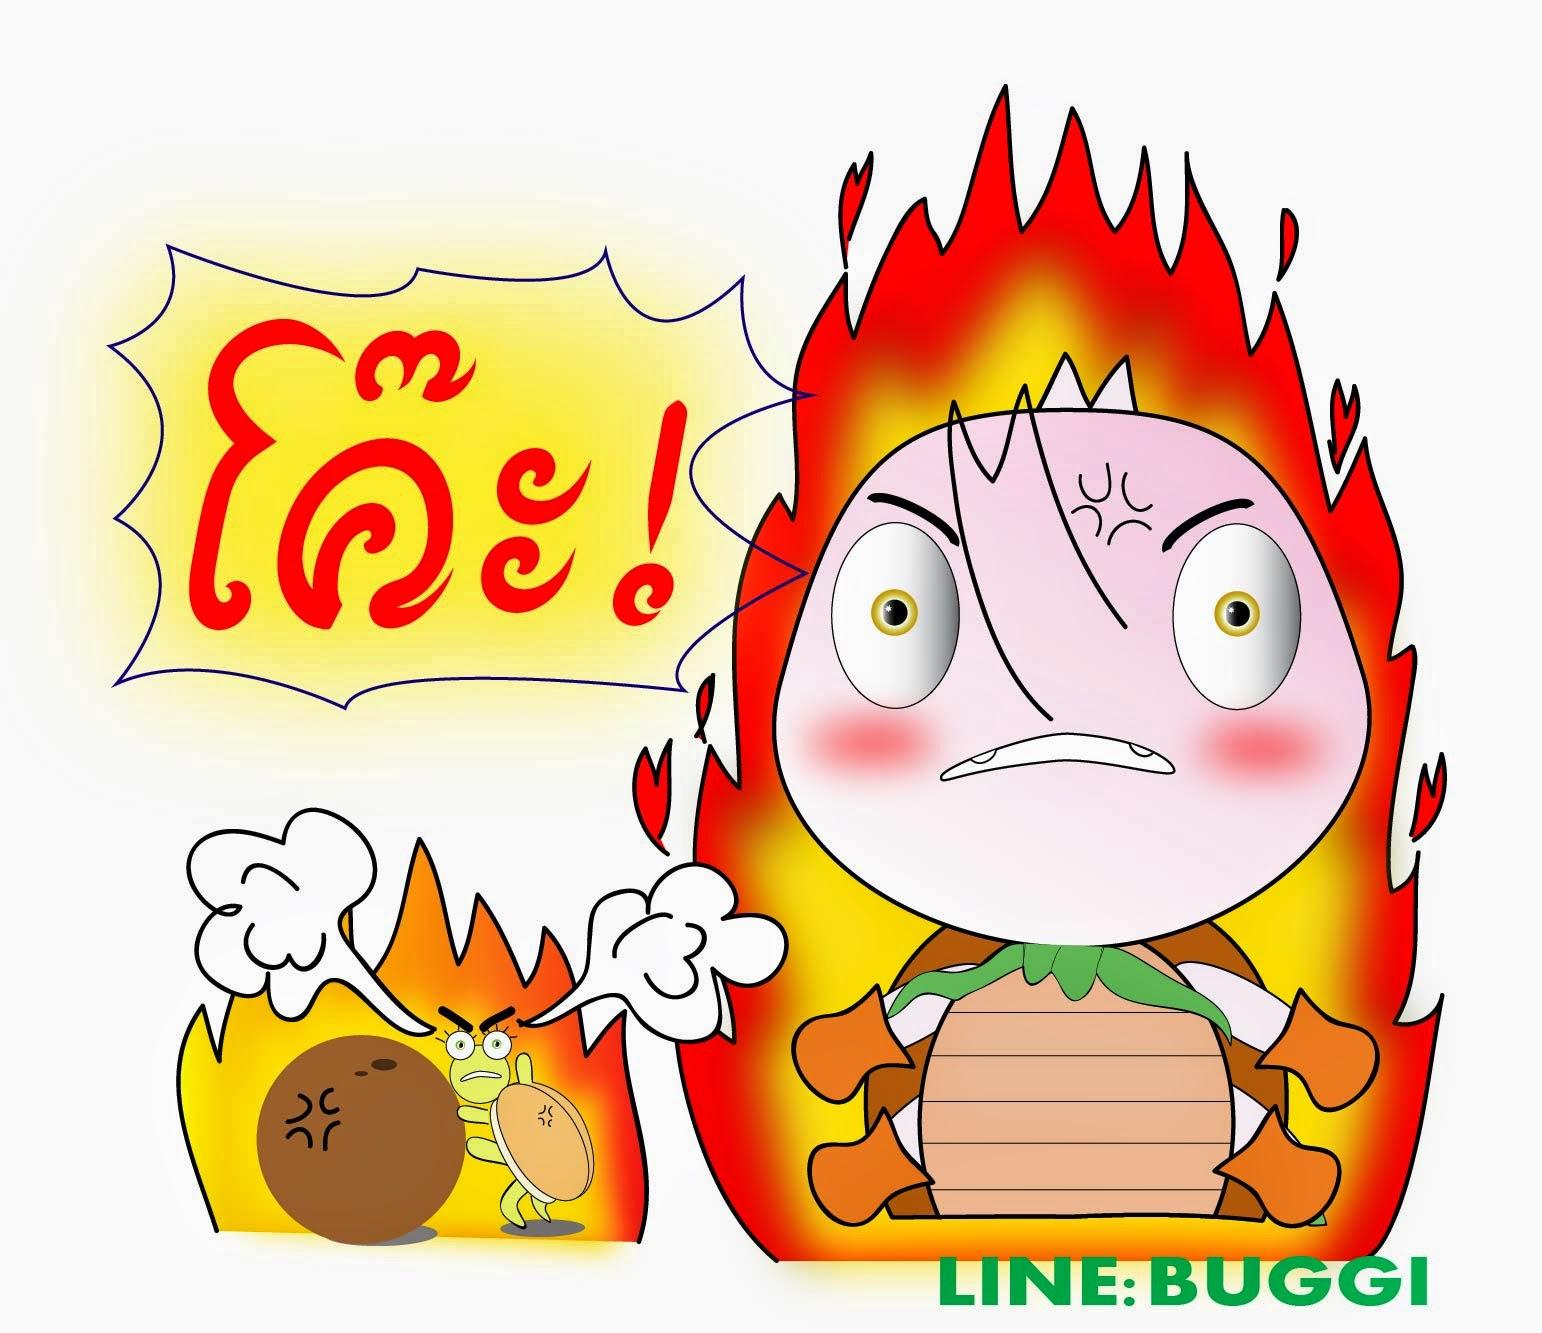 Buggi and Godji Gift Line Stickers